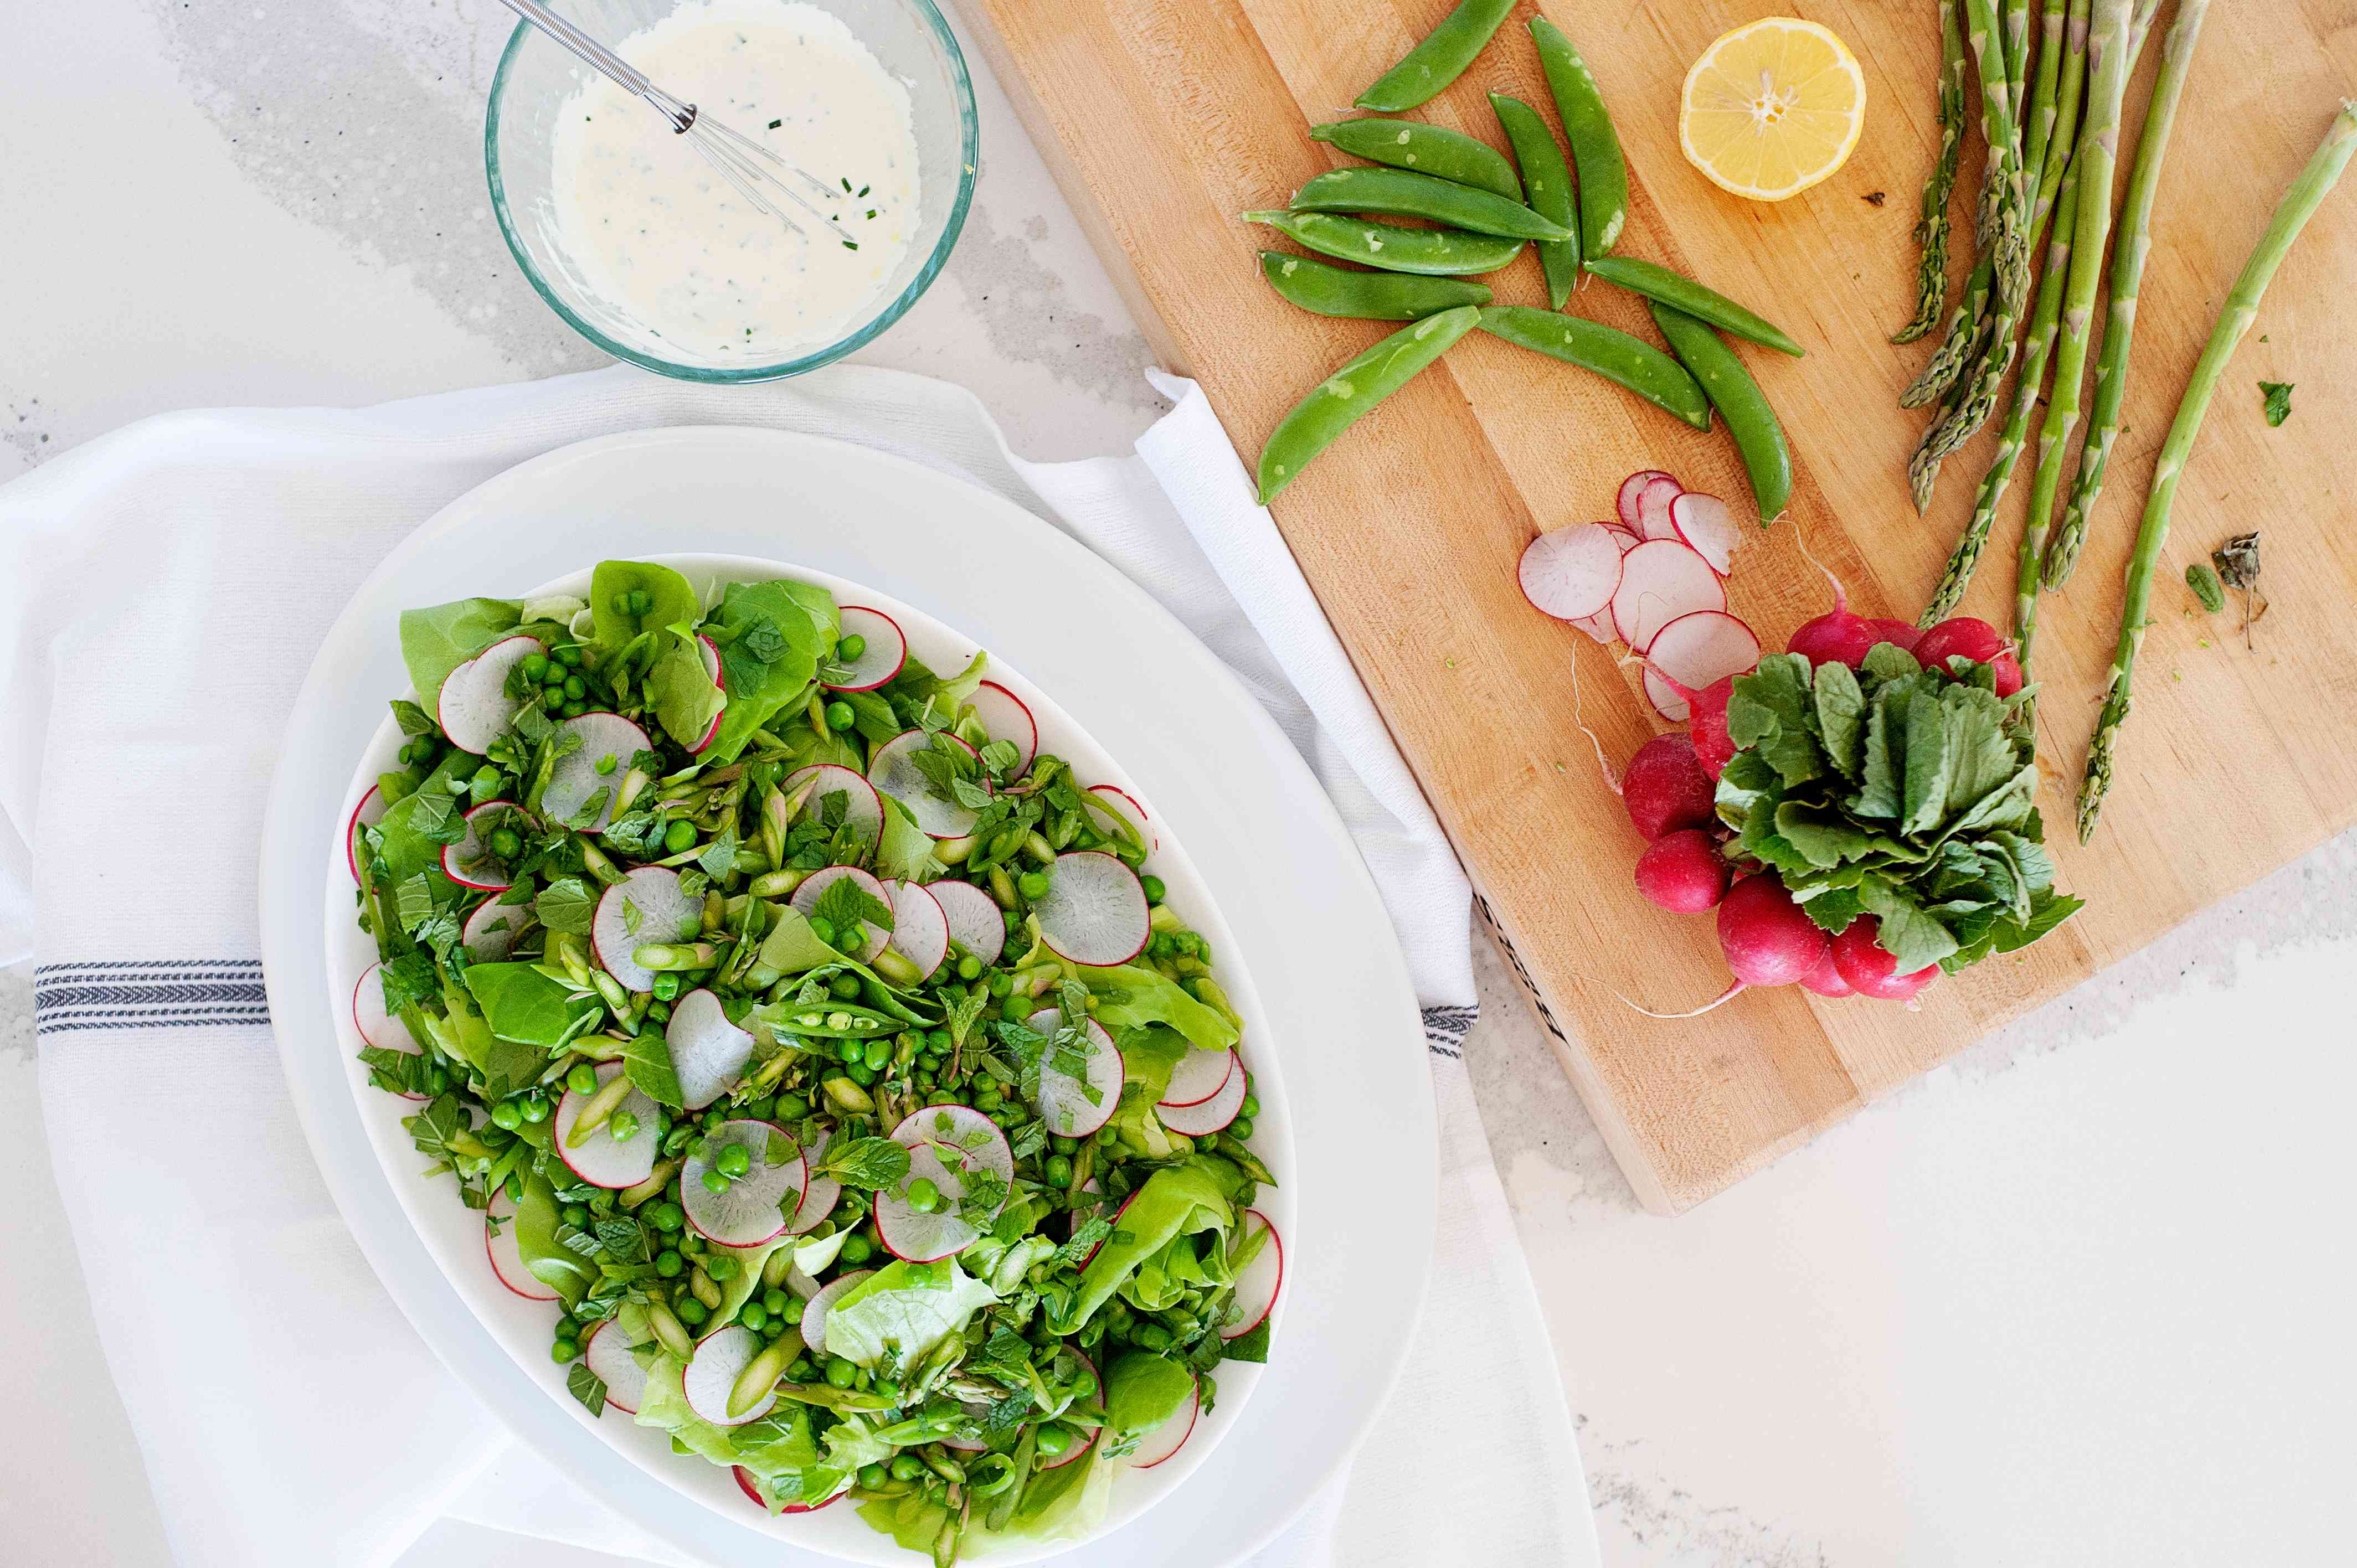 Greenest Spring Green Salad set next to a cutting board.